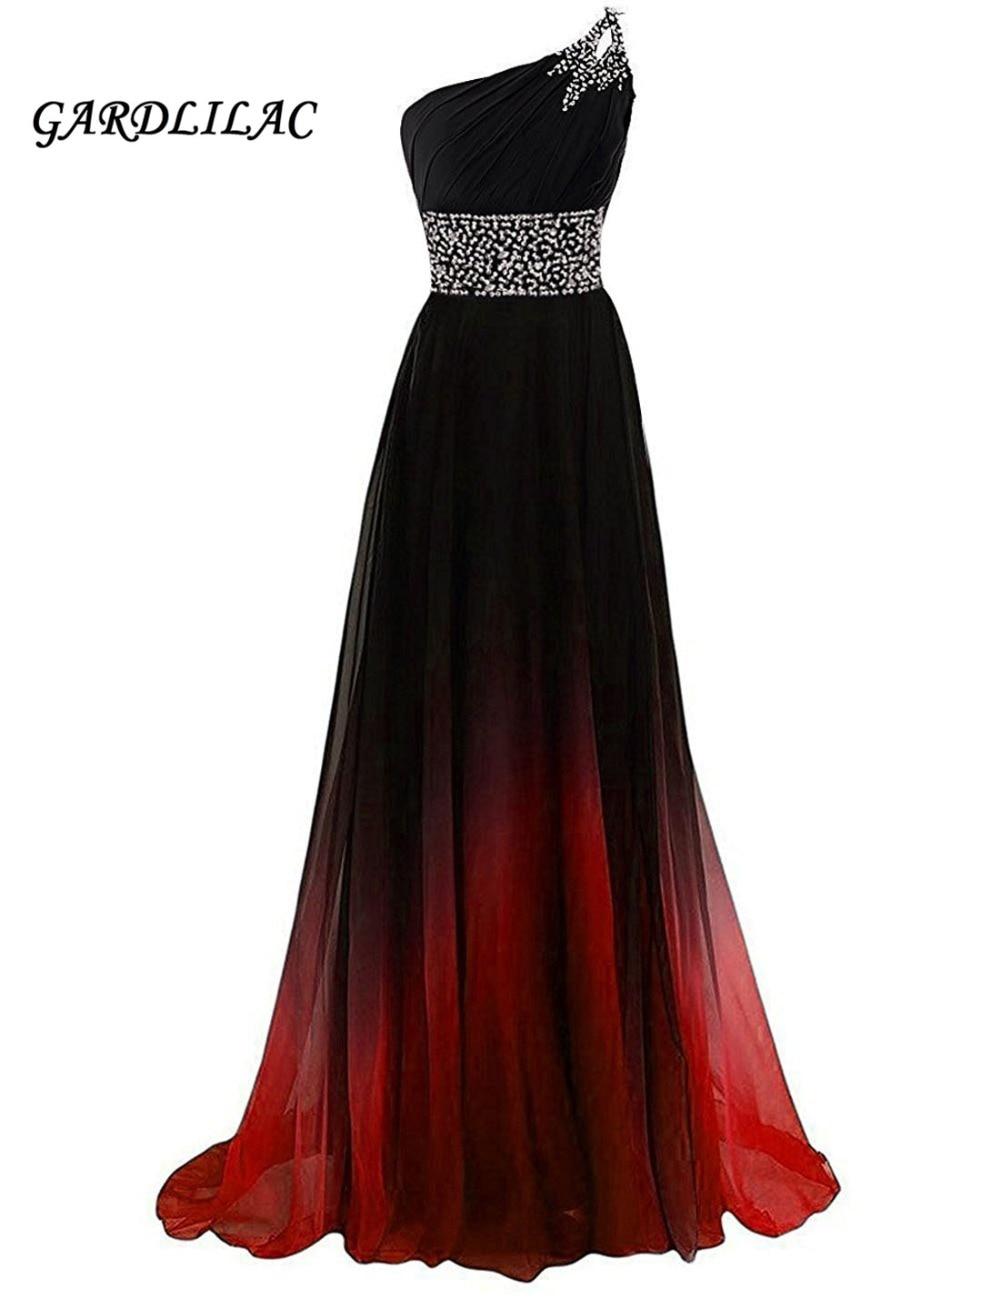 One-Shoulder Ombre Evening Dresses Vestido Longo Beaded Prom Dress 2019 Gradient Chiffon Prom Long Elegant Dress Plus Size